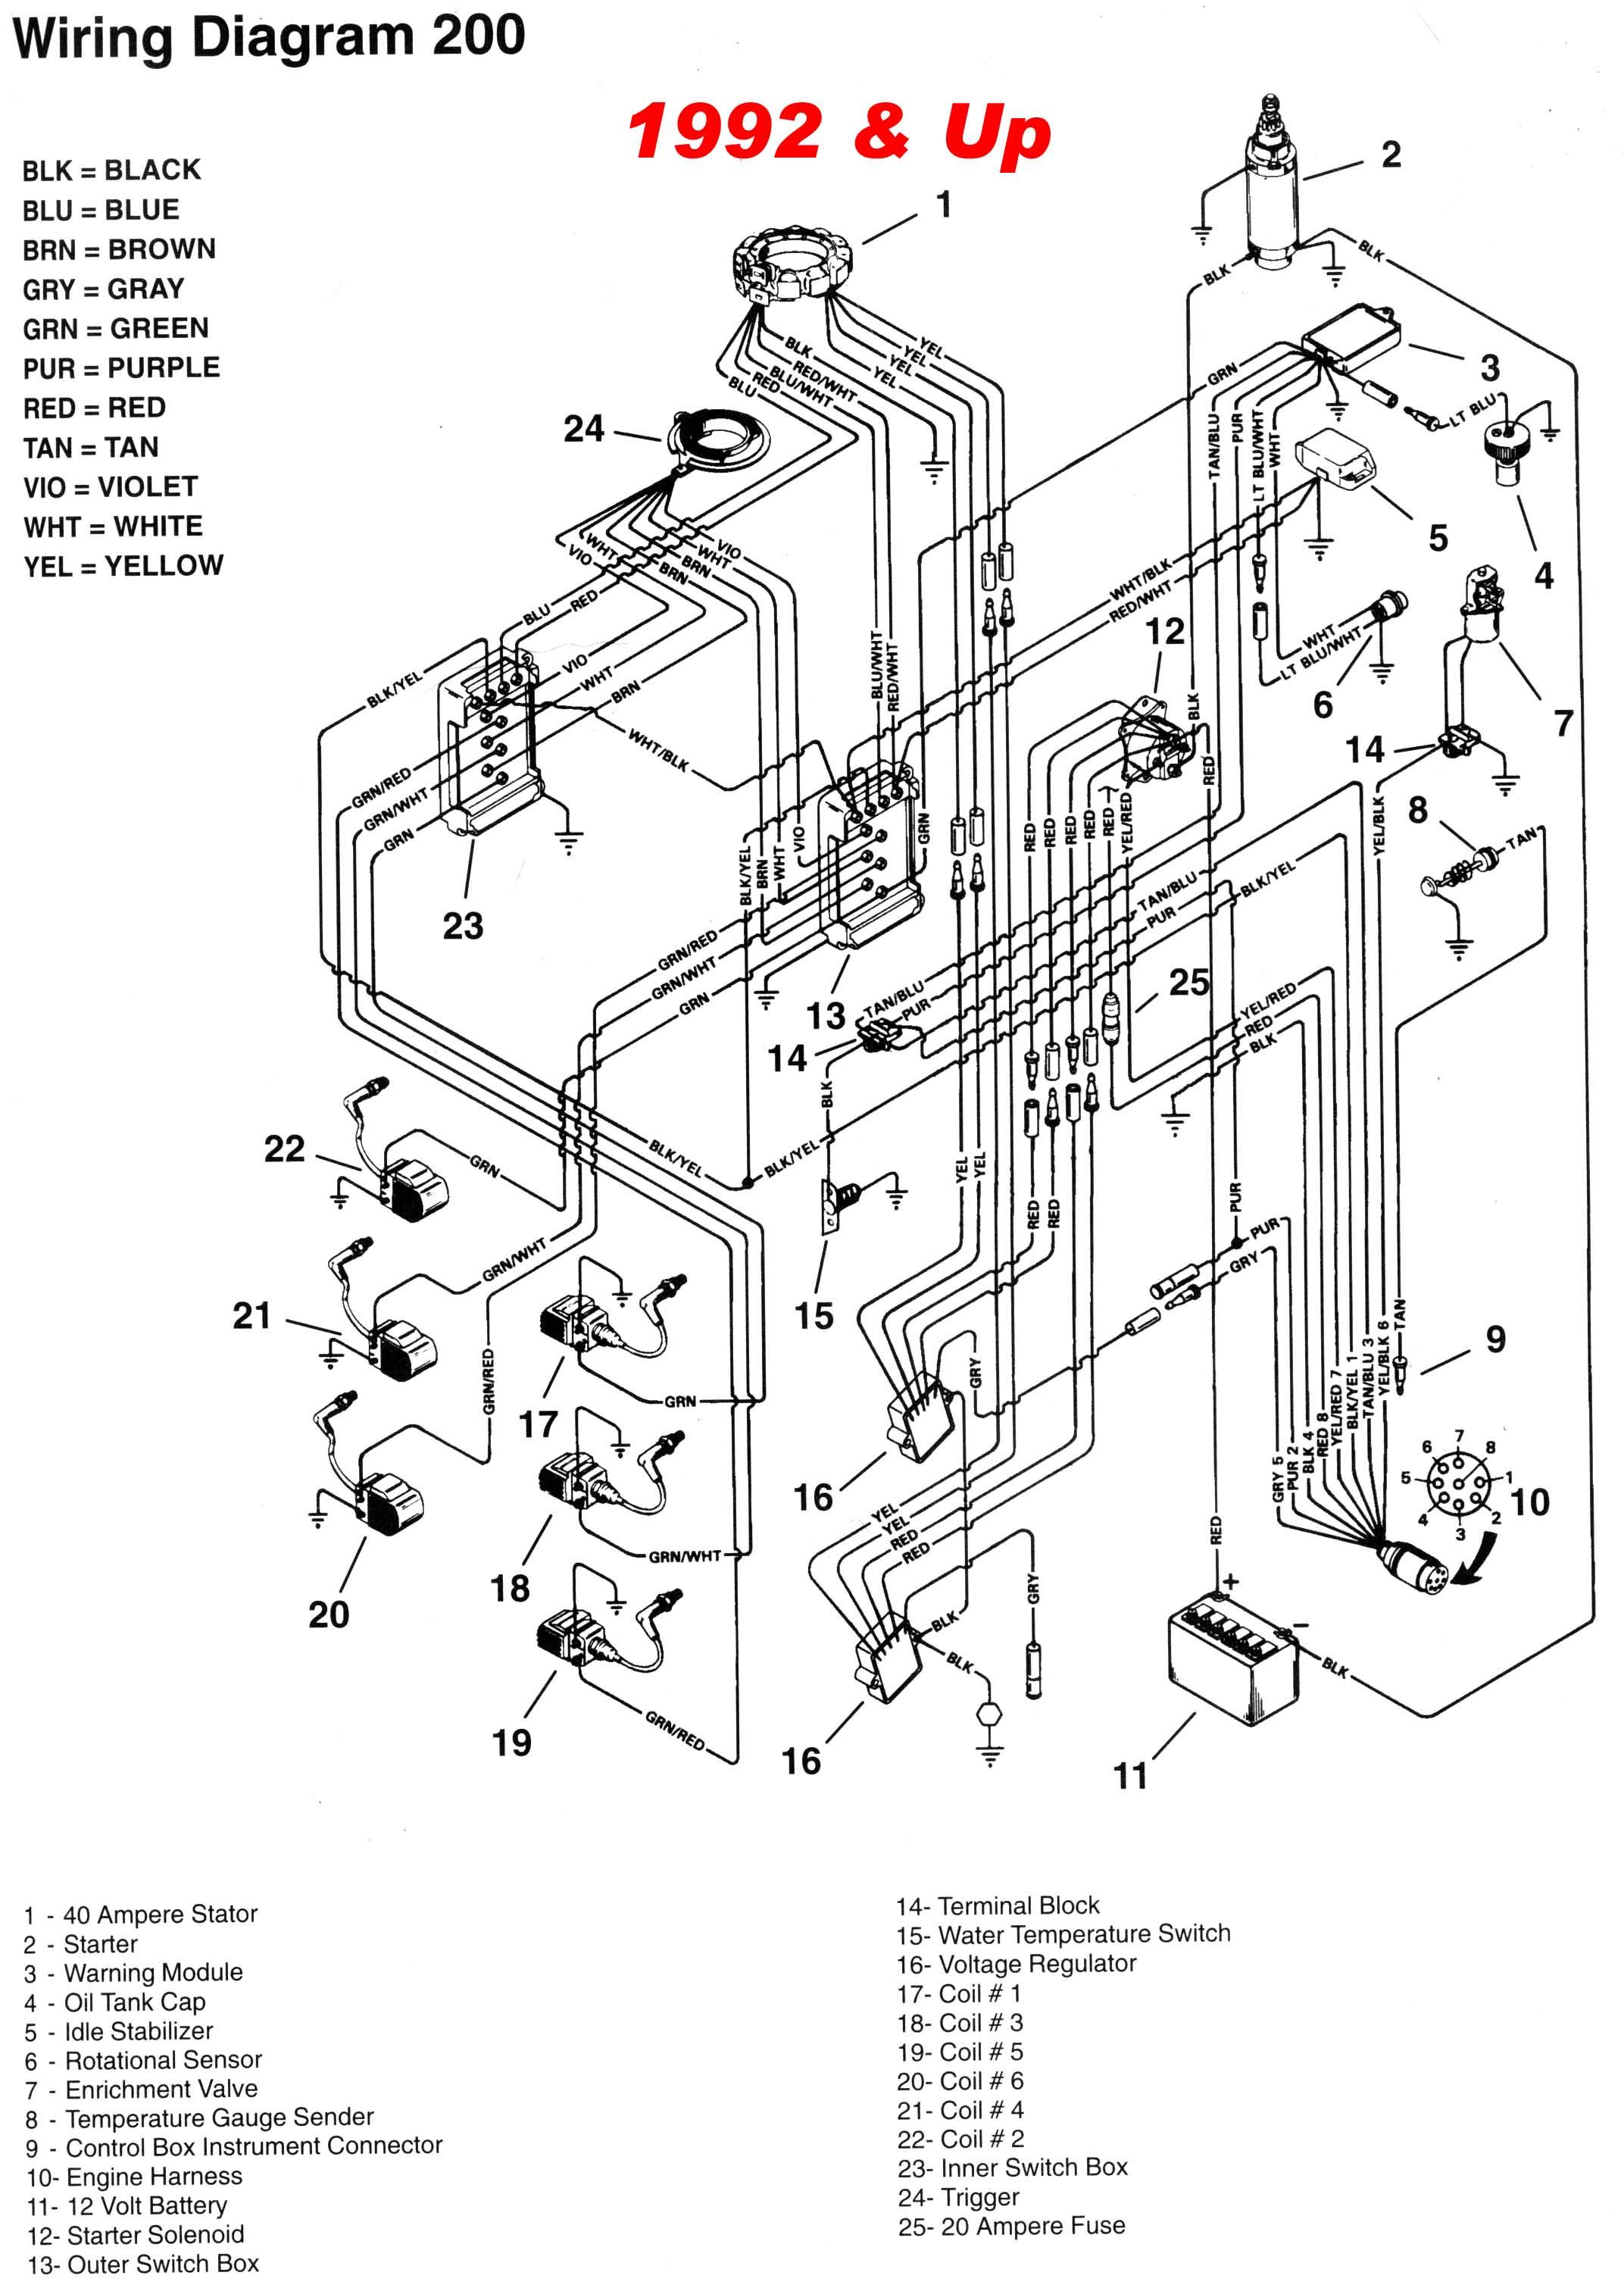 150 Hp Suzuki Wiring Schematics Simple Diagram Options Winnebago Harness Outboard Library